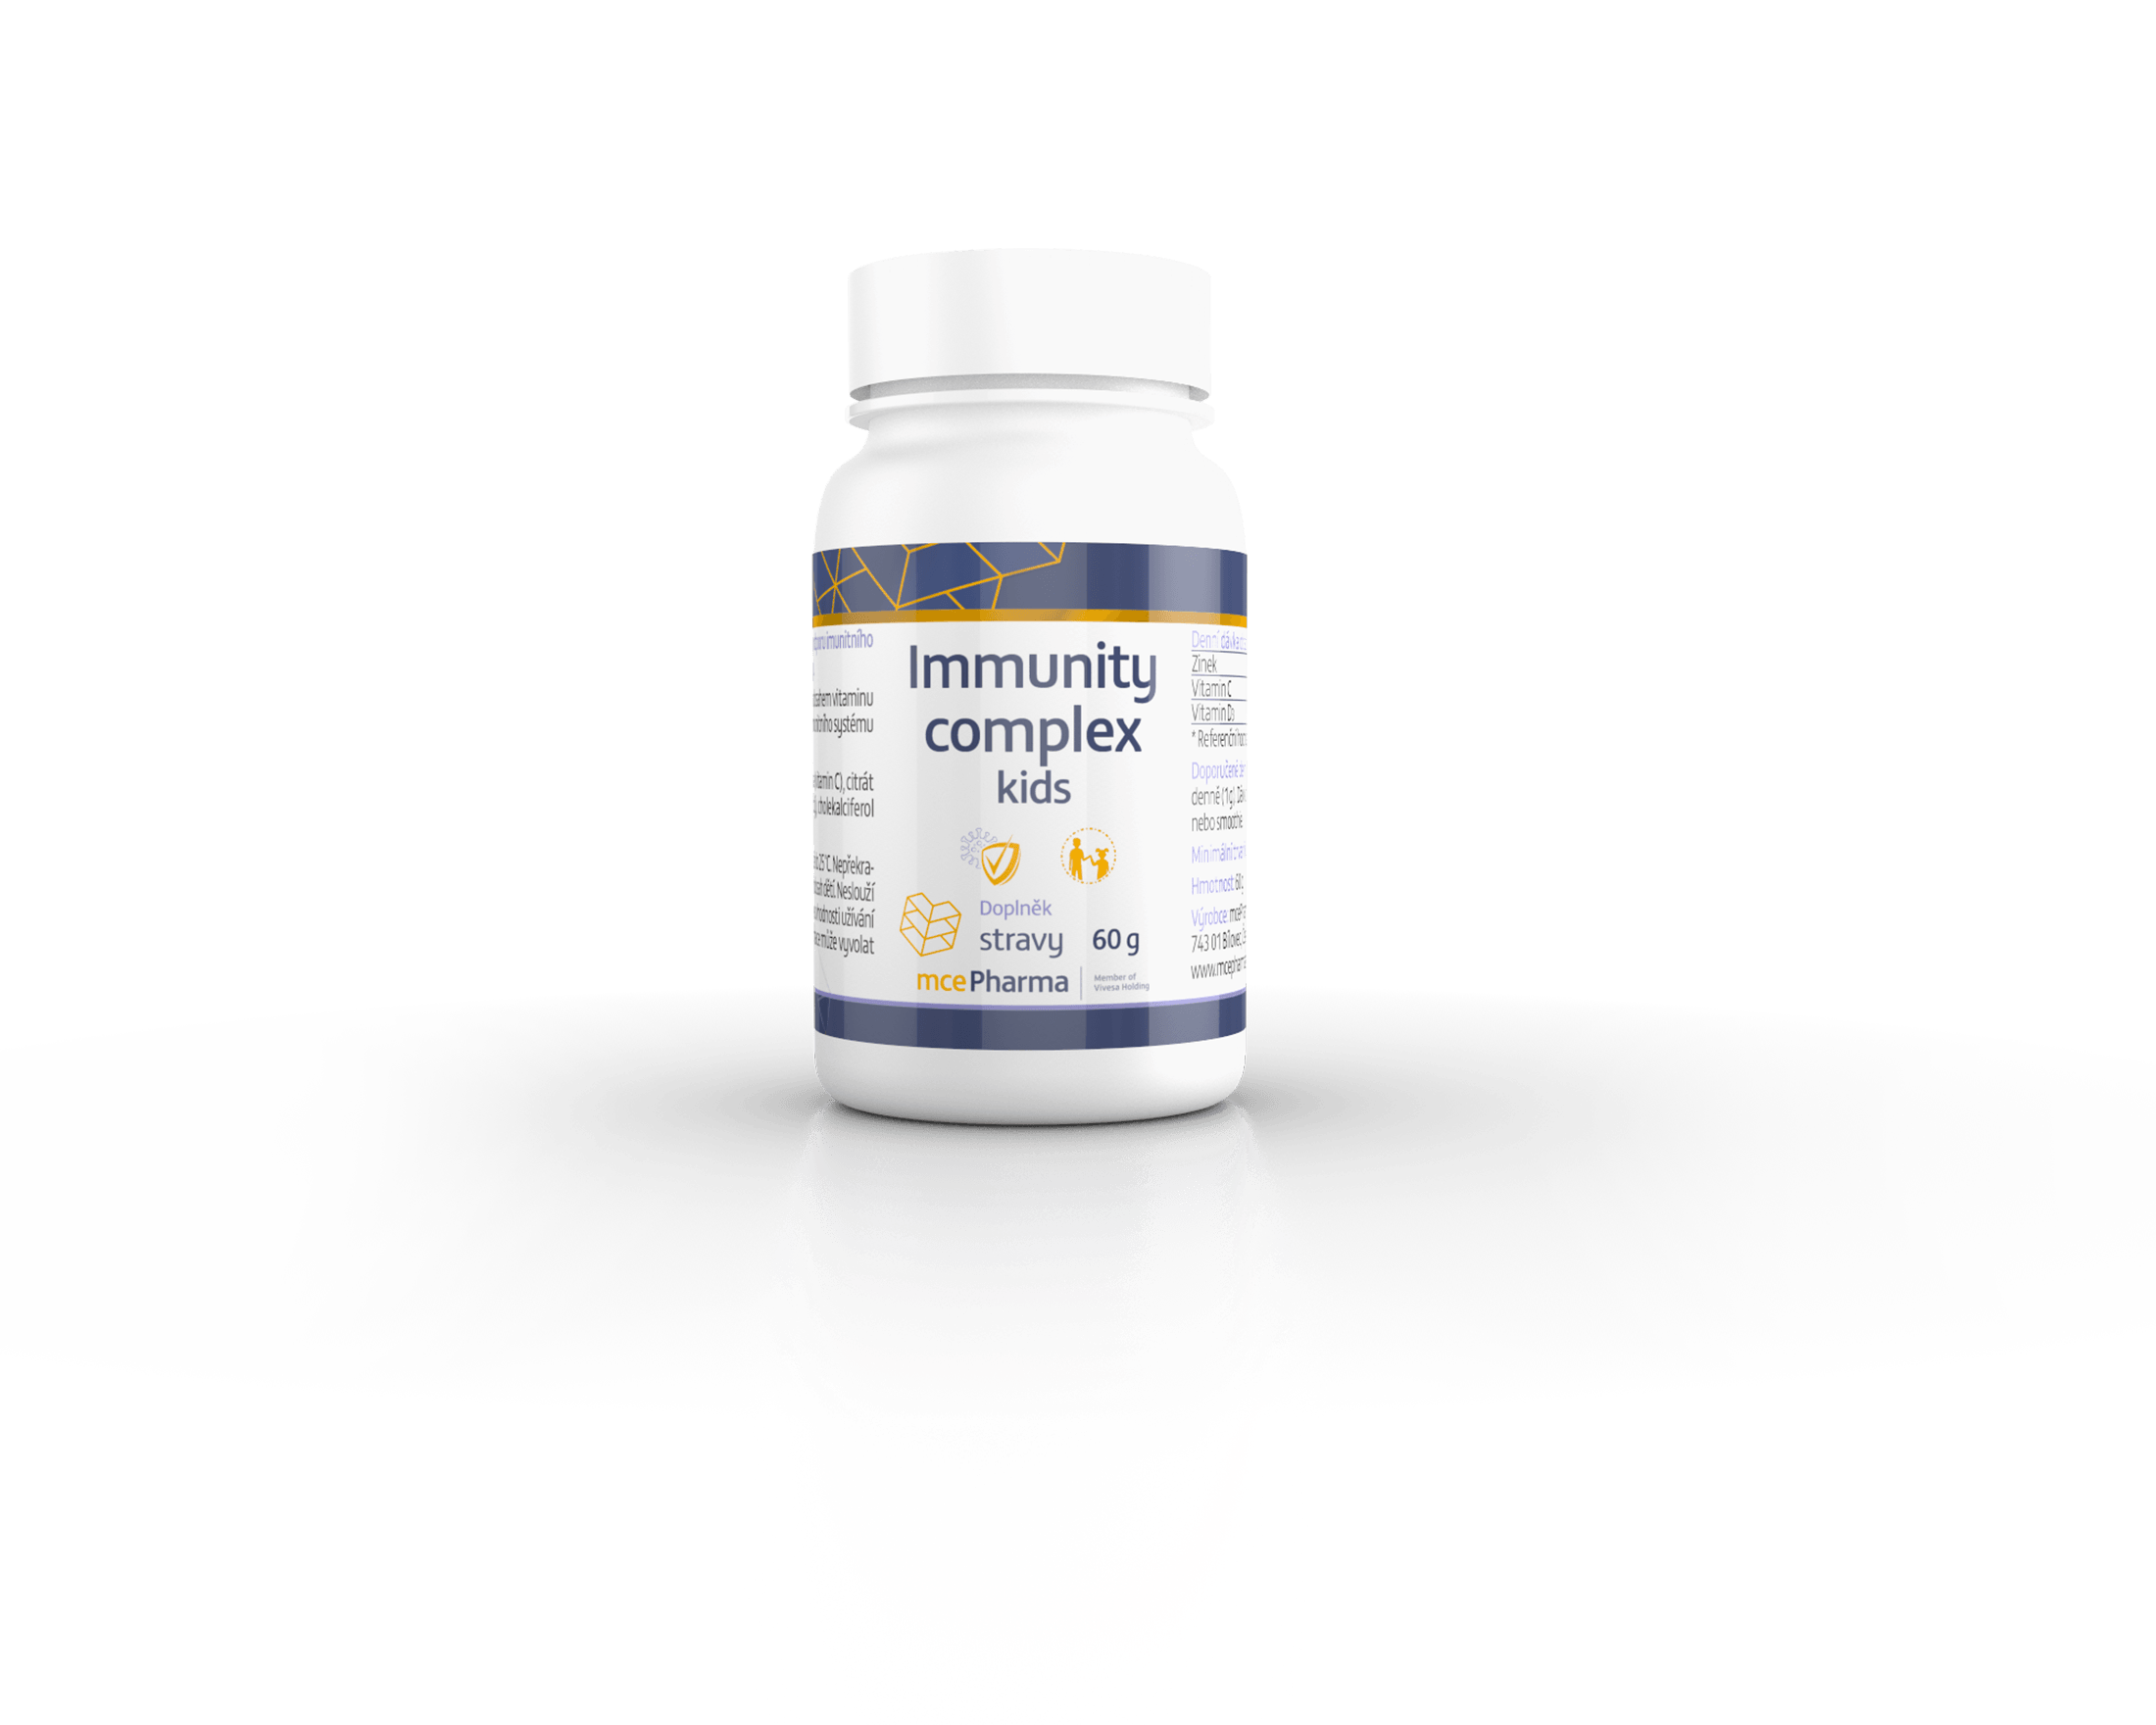 vizu-flakon-Immunity-COMPLEX-Kids-60g-CZE-NOBACK